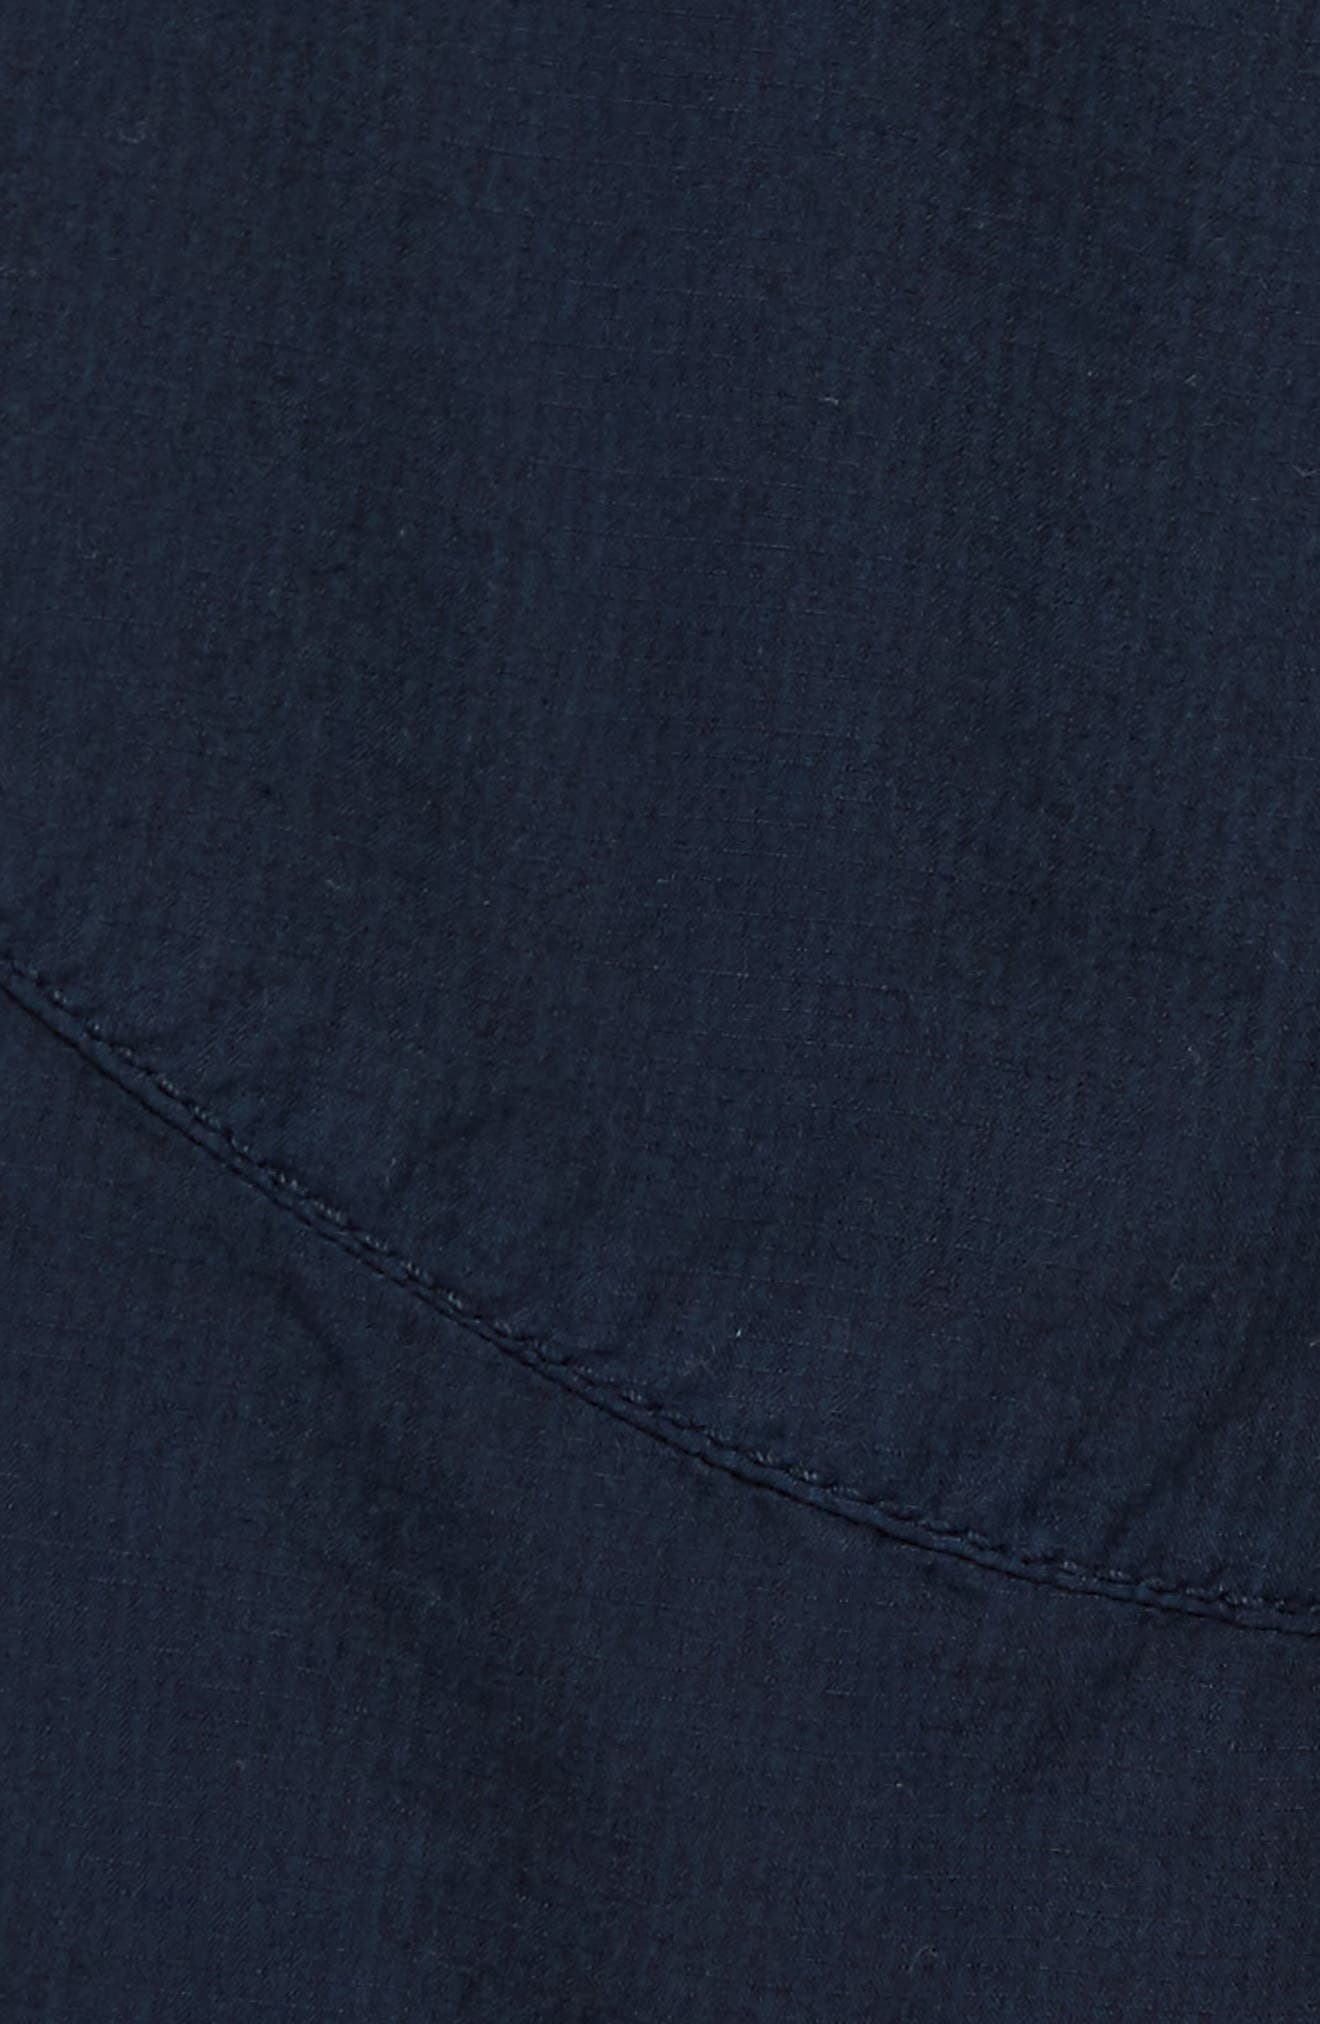 'Oxnard' Cargo Shorts,                             Alternate thumbnail 5, color,                             Navy